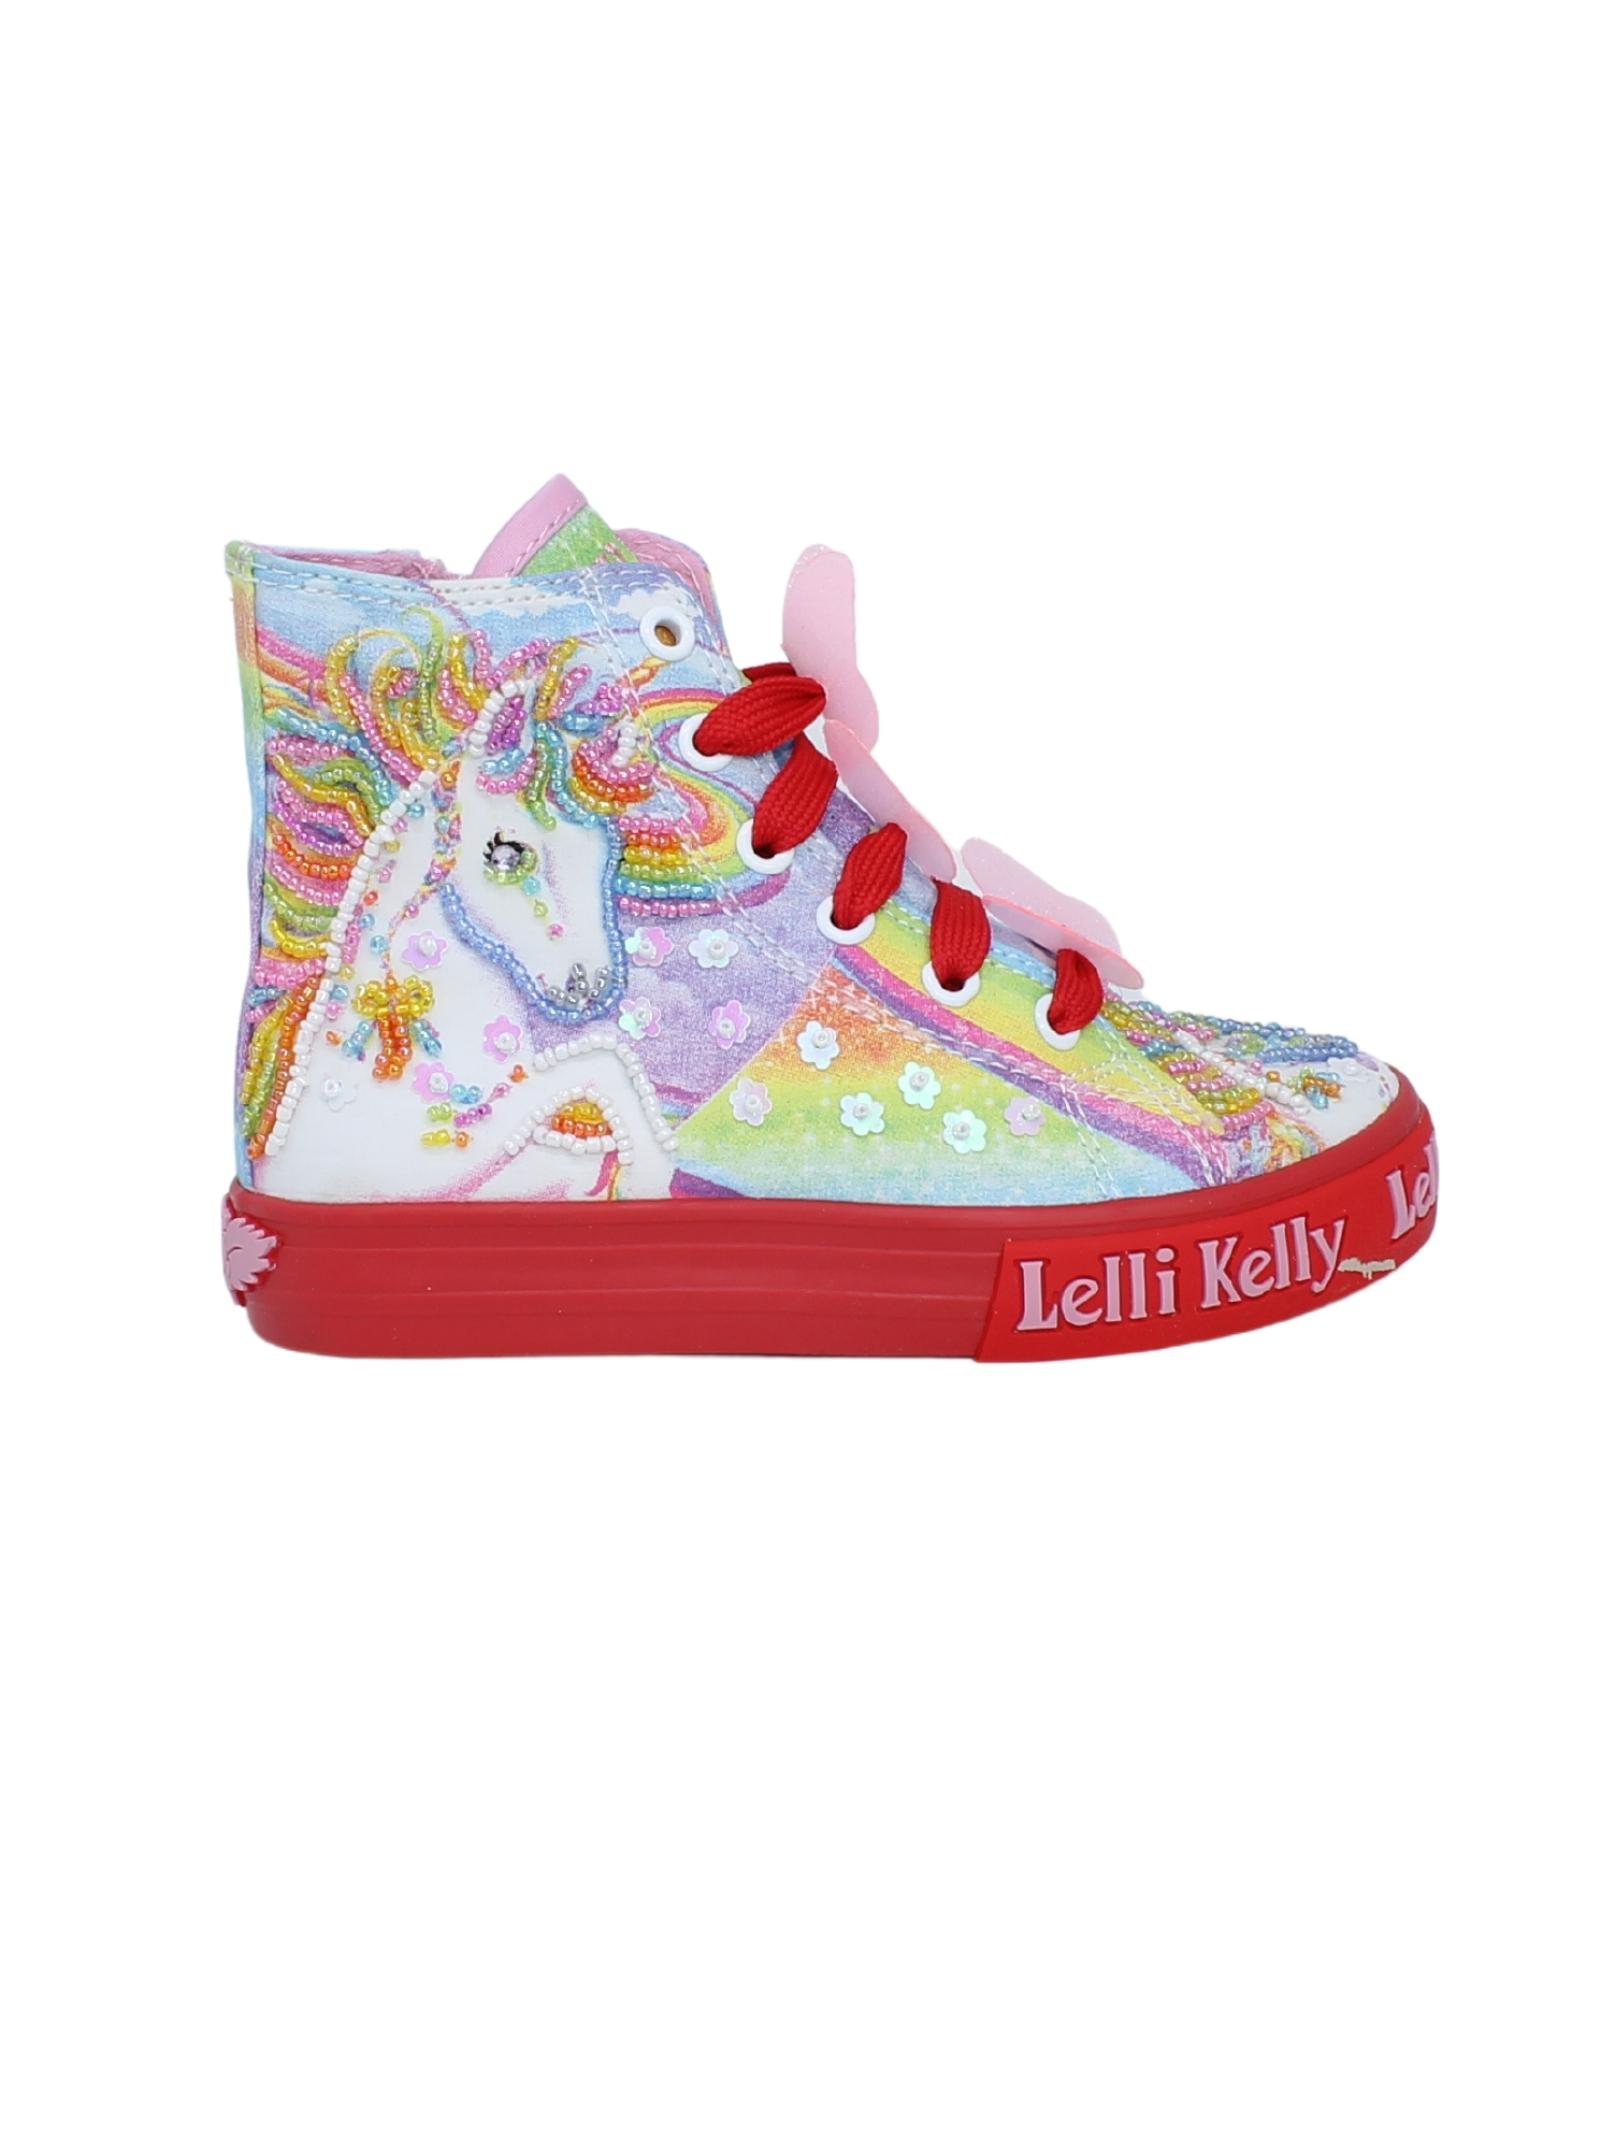 Converse Unicorno Red LELLI KELLY | Sneakers | LK9099ROSSO